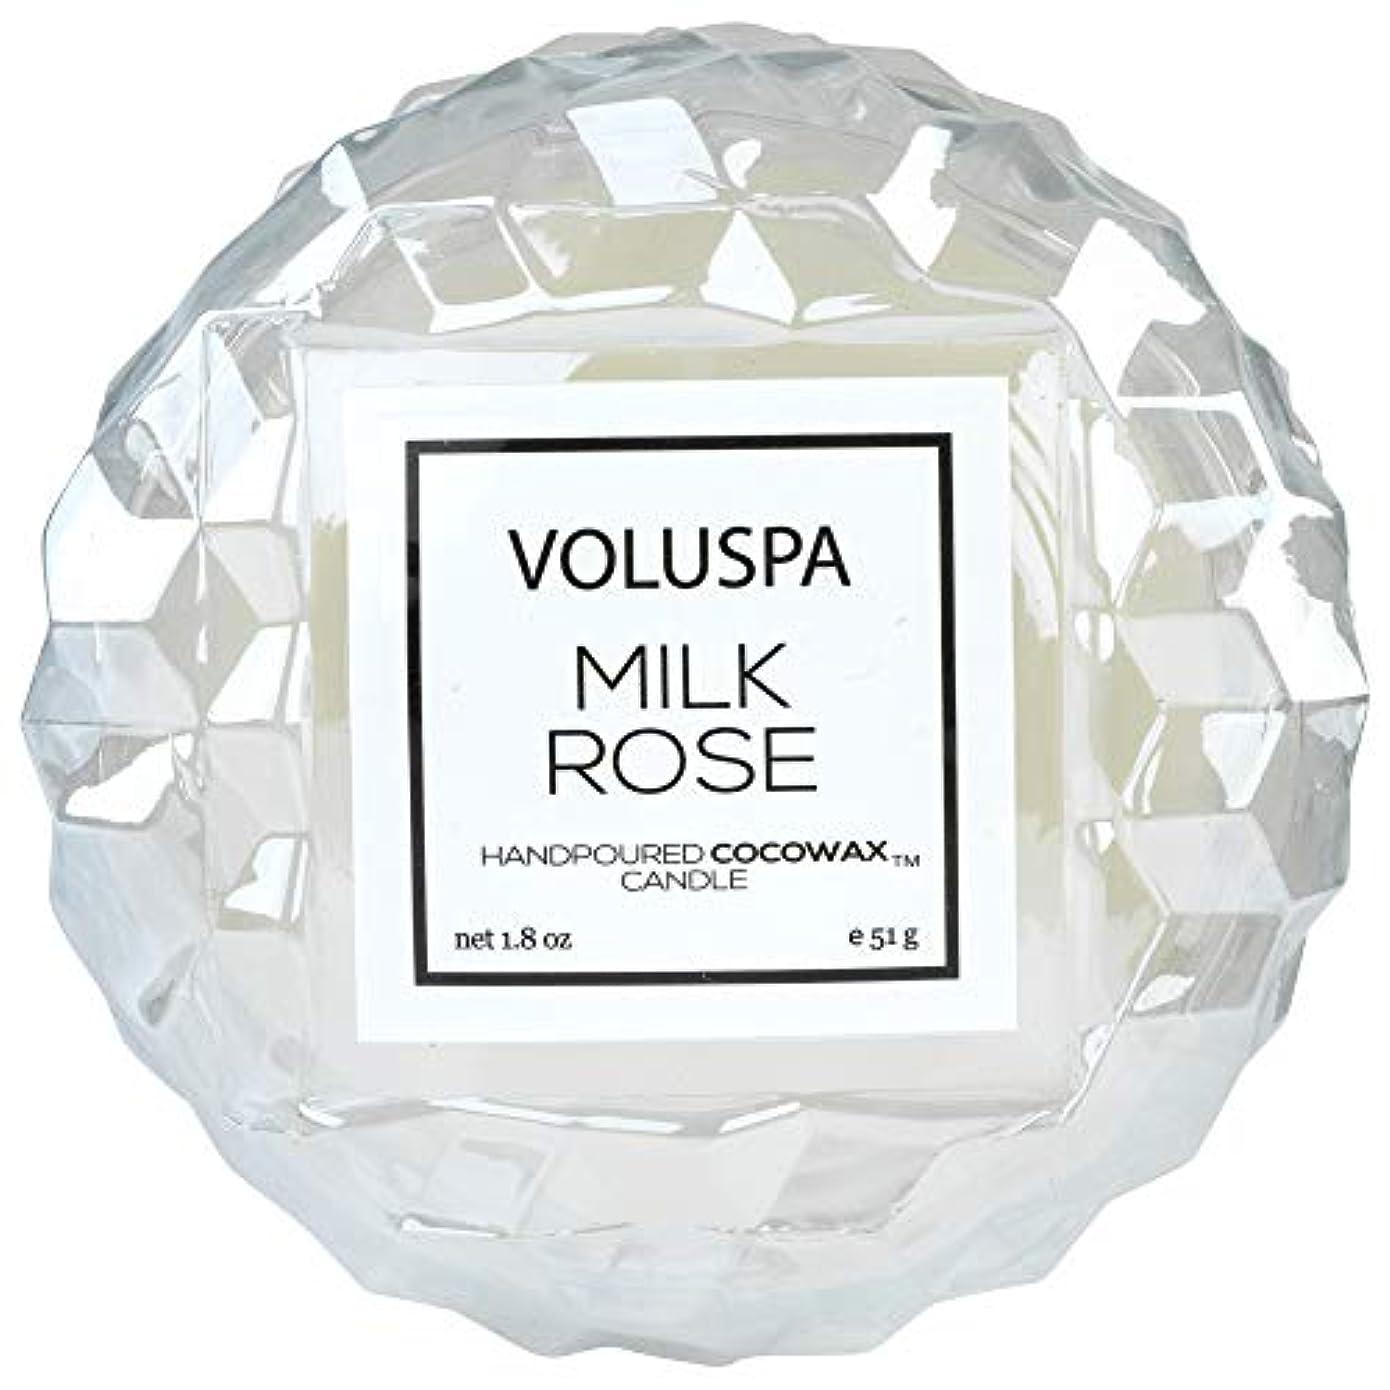 VOLUSPA ローズマカロンキャンドル ミルクローズ 51g ボルスパ